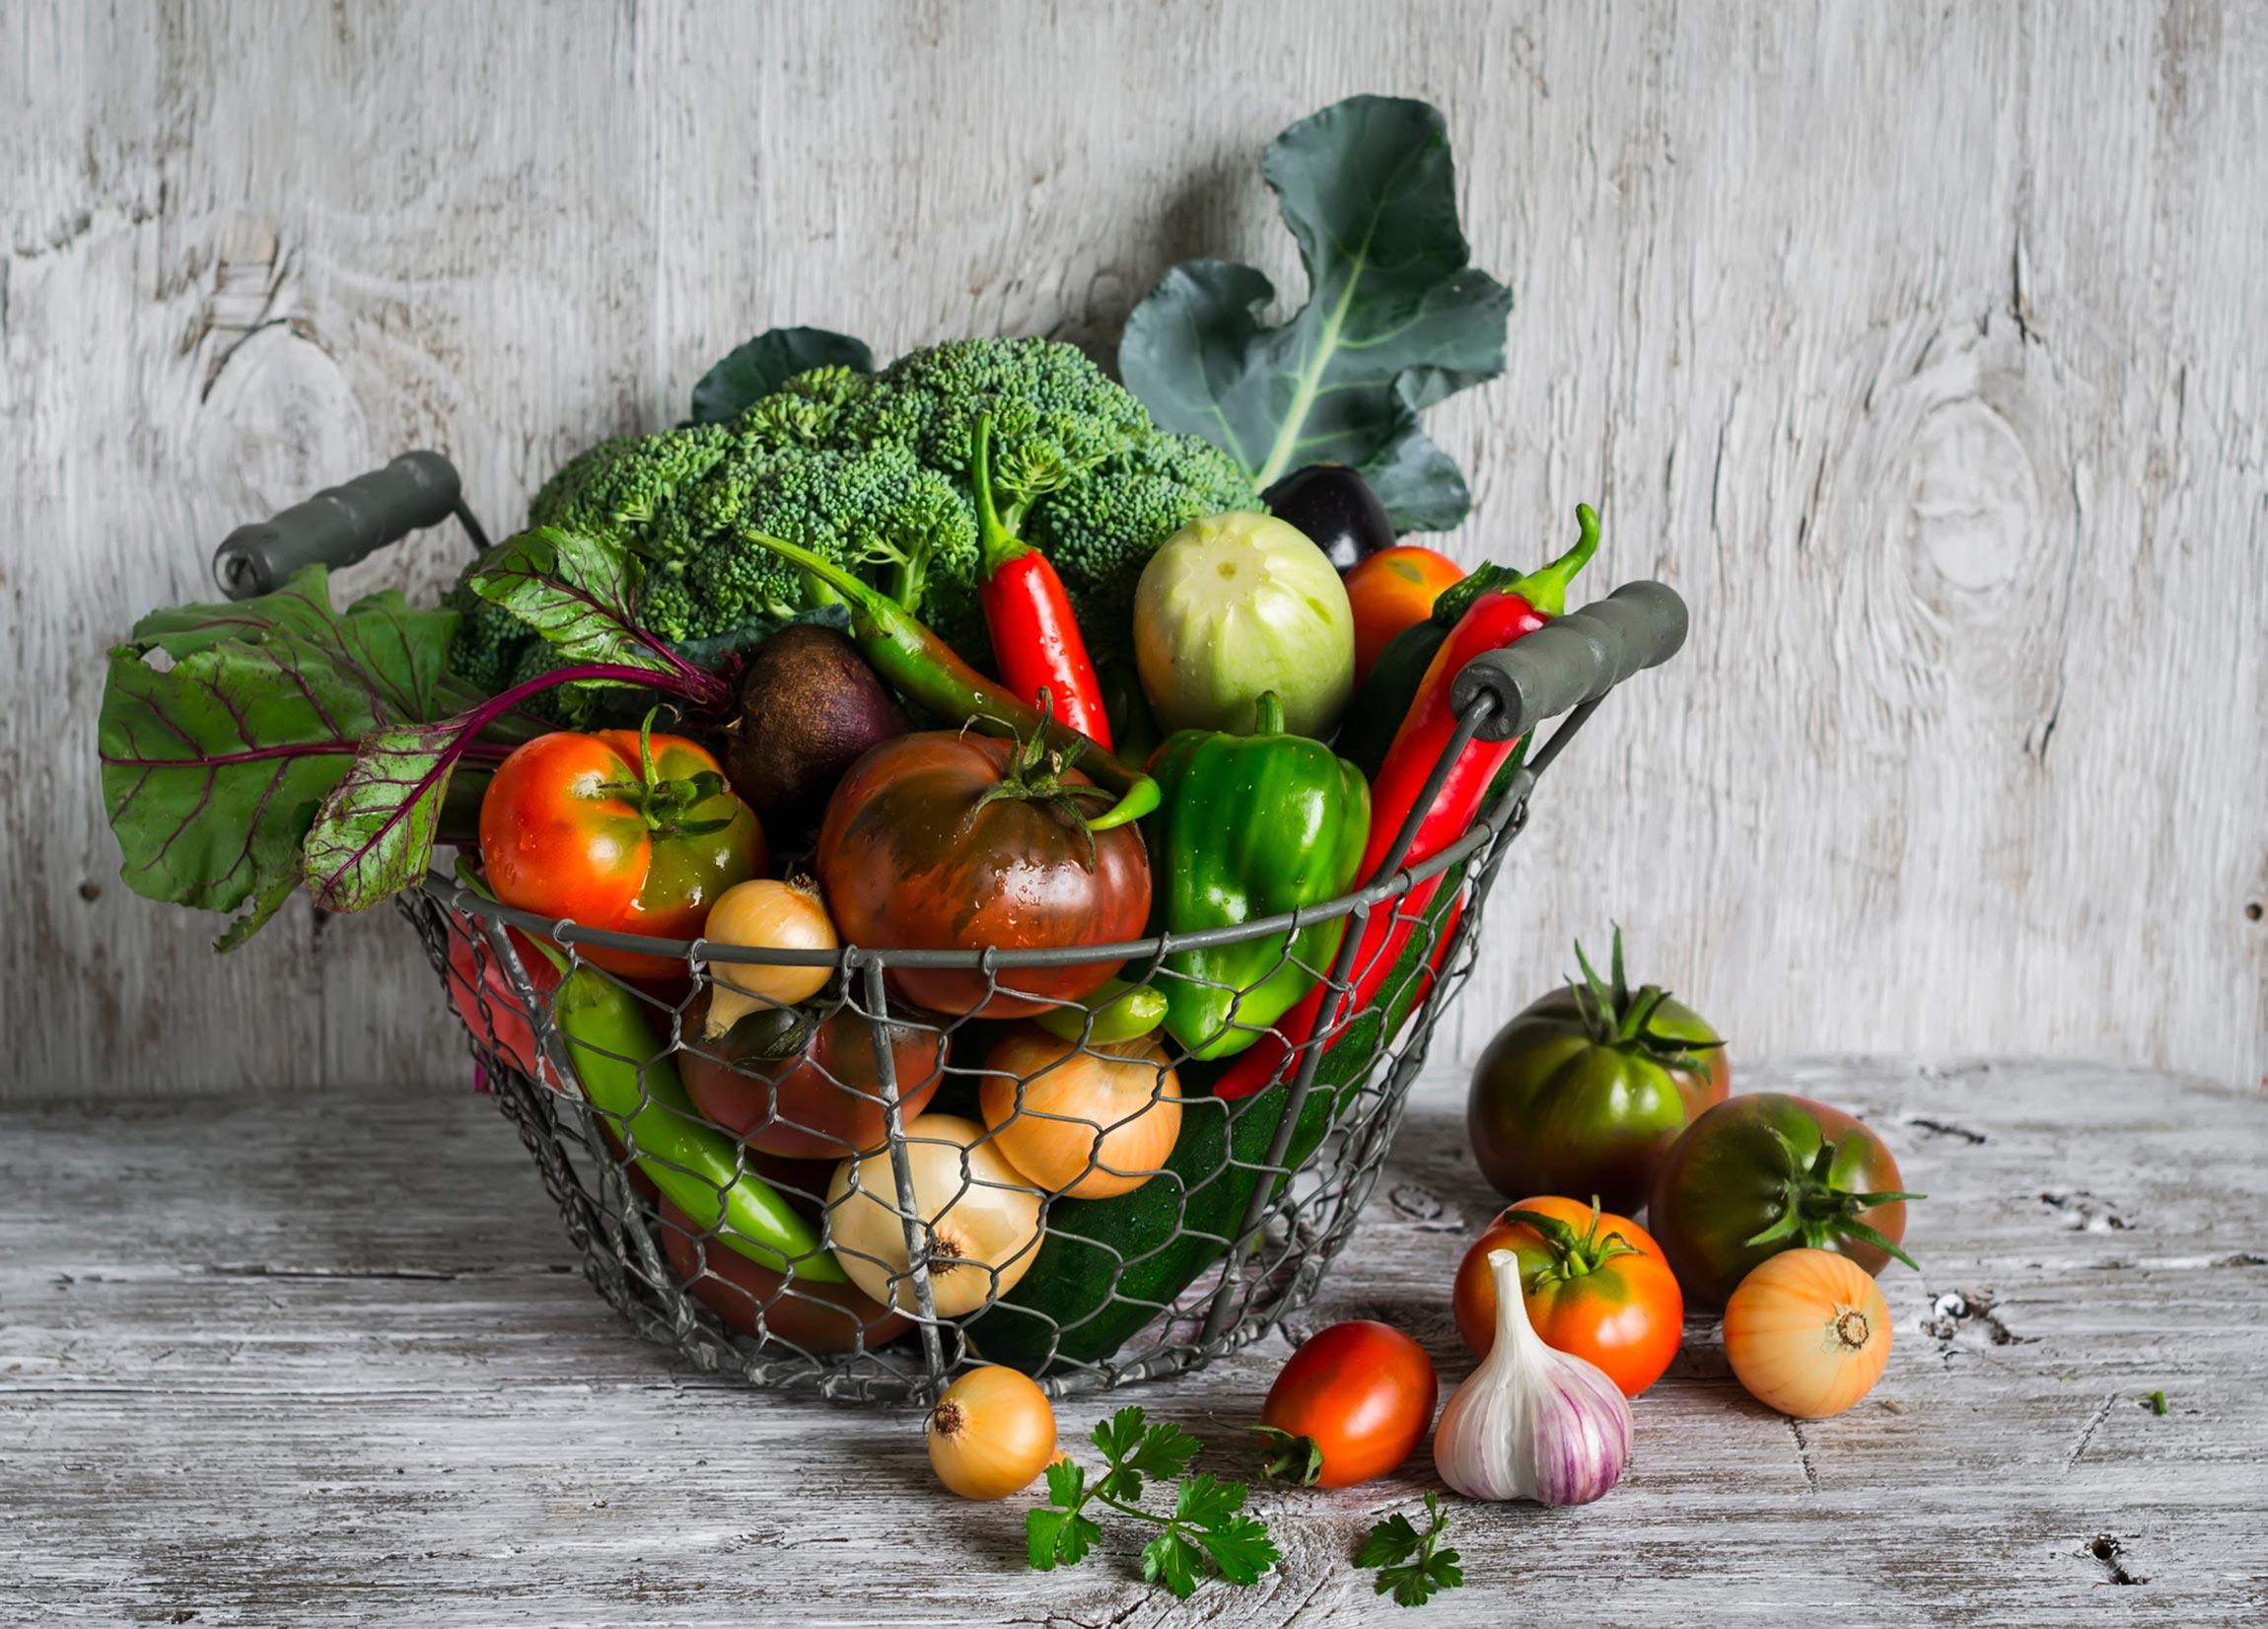 Photo courtesy of Food Revolution